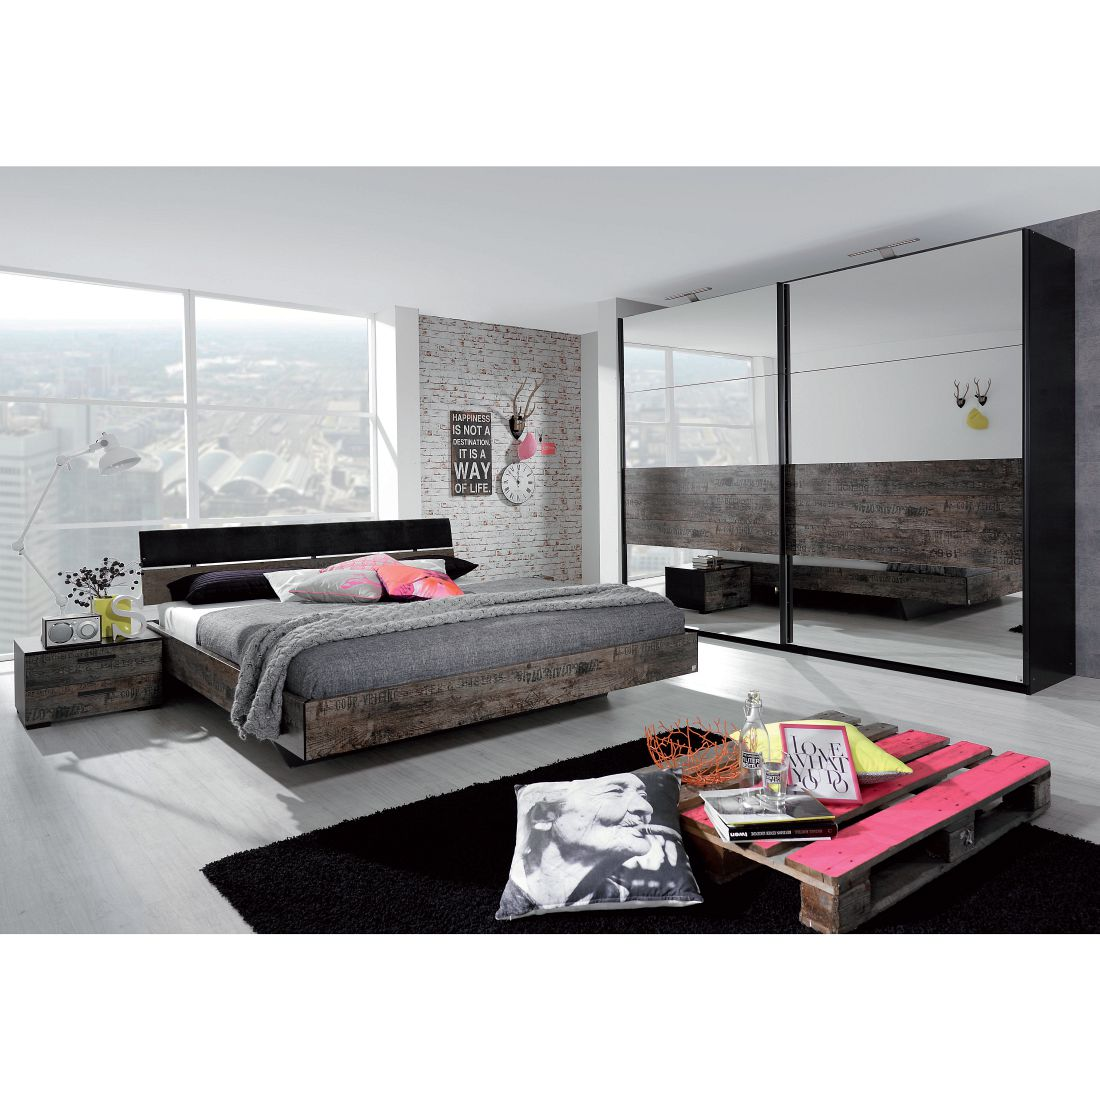 Schlafzimmerset Sumatra II (4teilig) - Vintage Braun - Liegefläche Bett: 160 x 200cm, Rauch Select